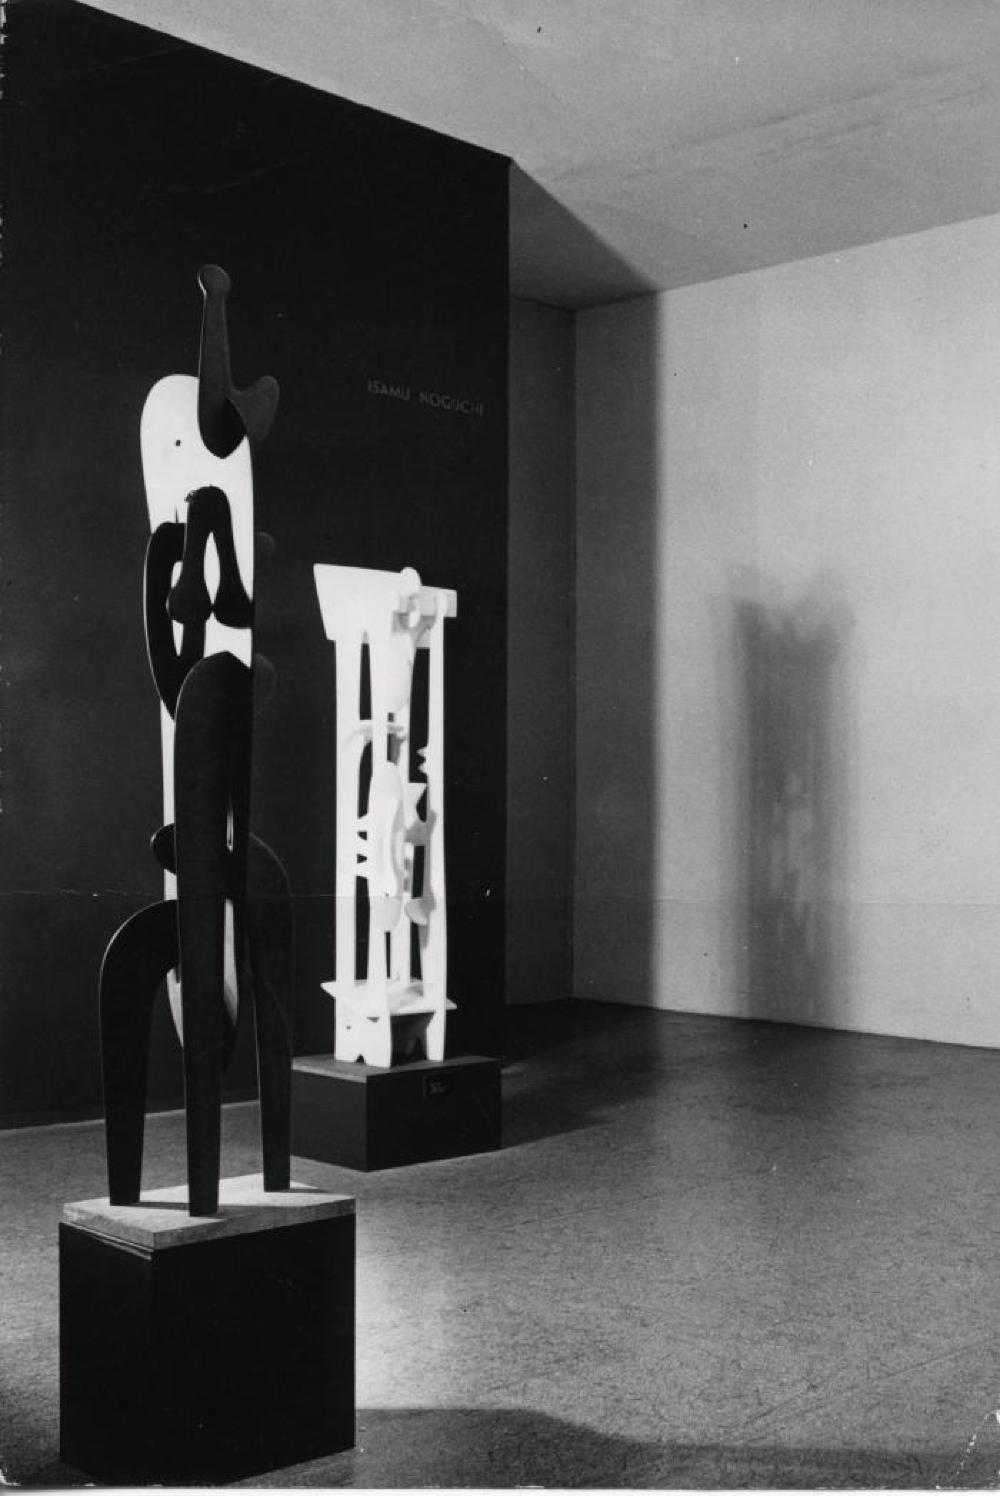 Statue, image 8